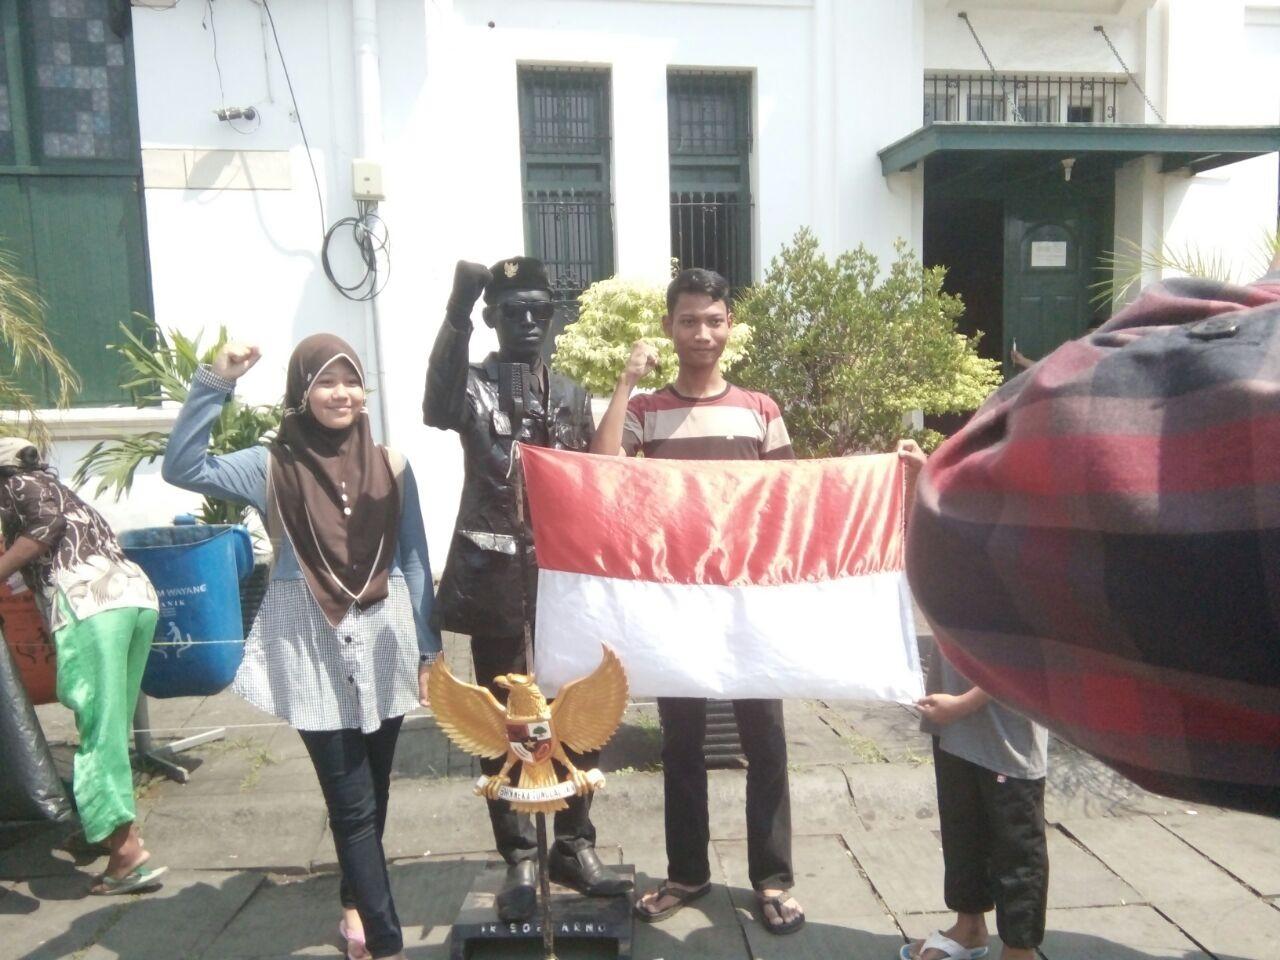 Idul fitri greeting indonesian or arabic way national the idul fitri greeting indonesian or arabic way m4hsunfo